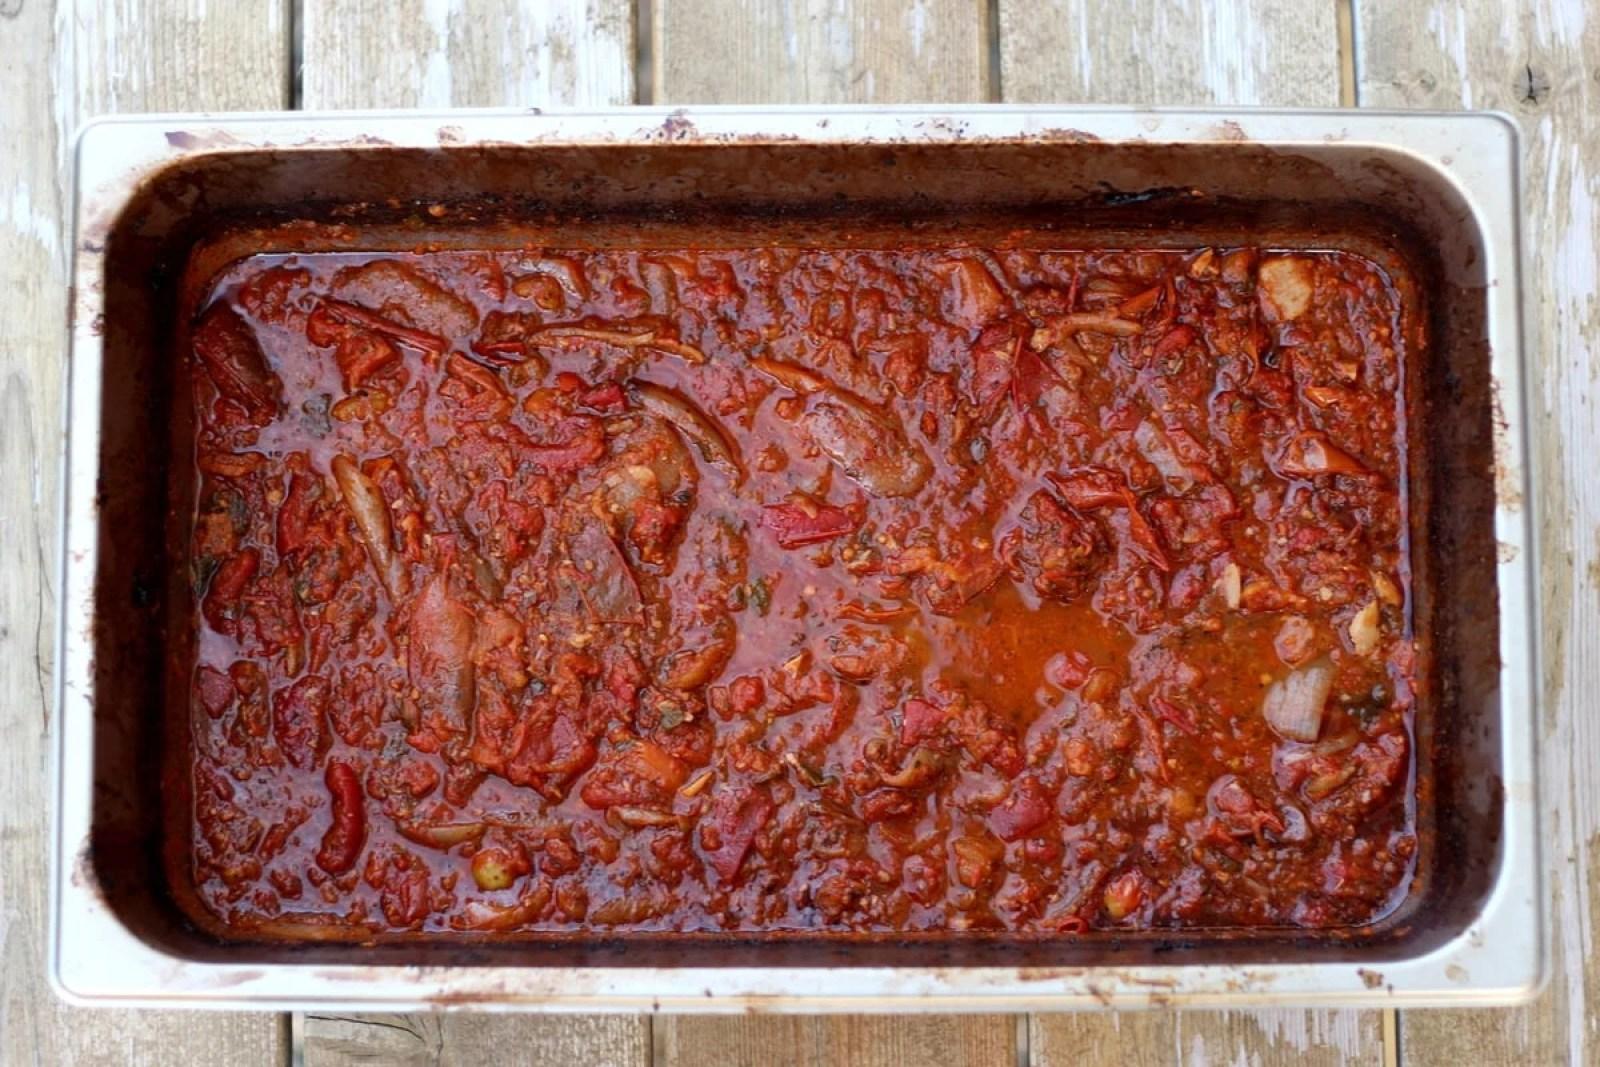 Slow roasted homemade spaghetti sauce thewoodenskillet.com